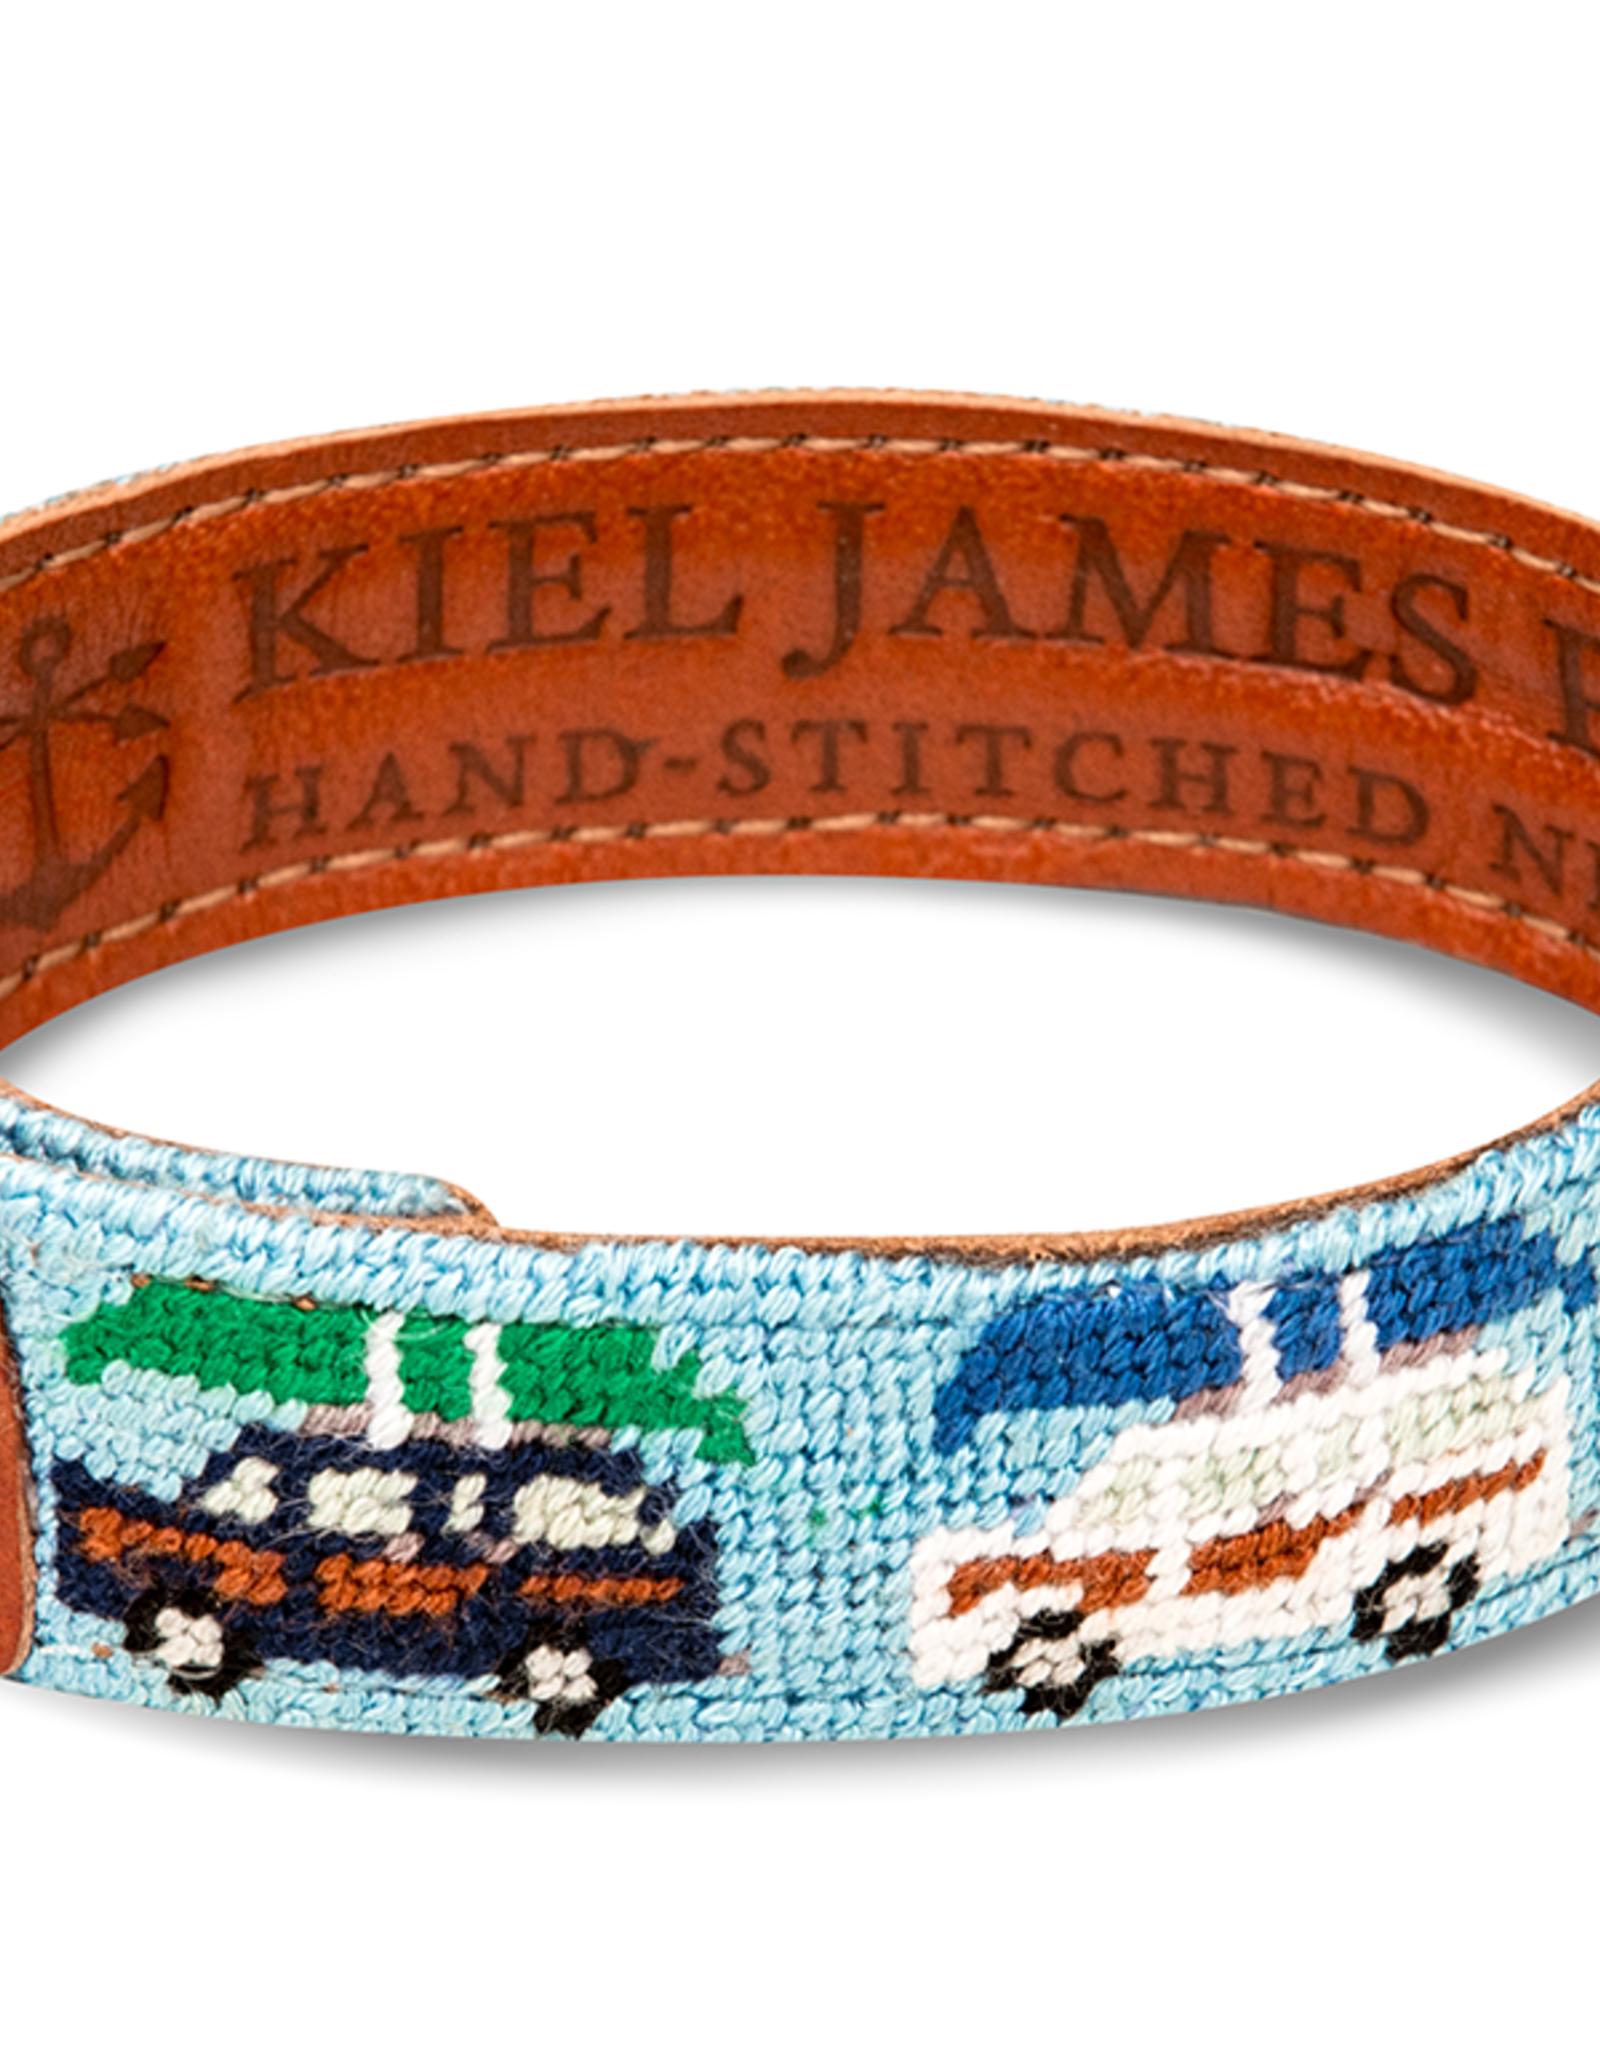 Kiel James Patrick Wood Is Good Bracelet